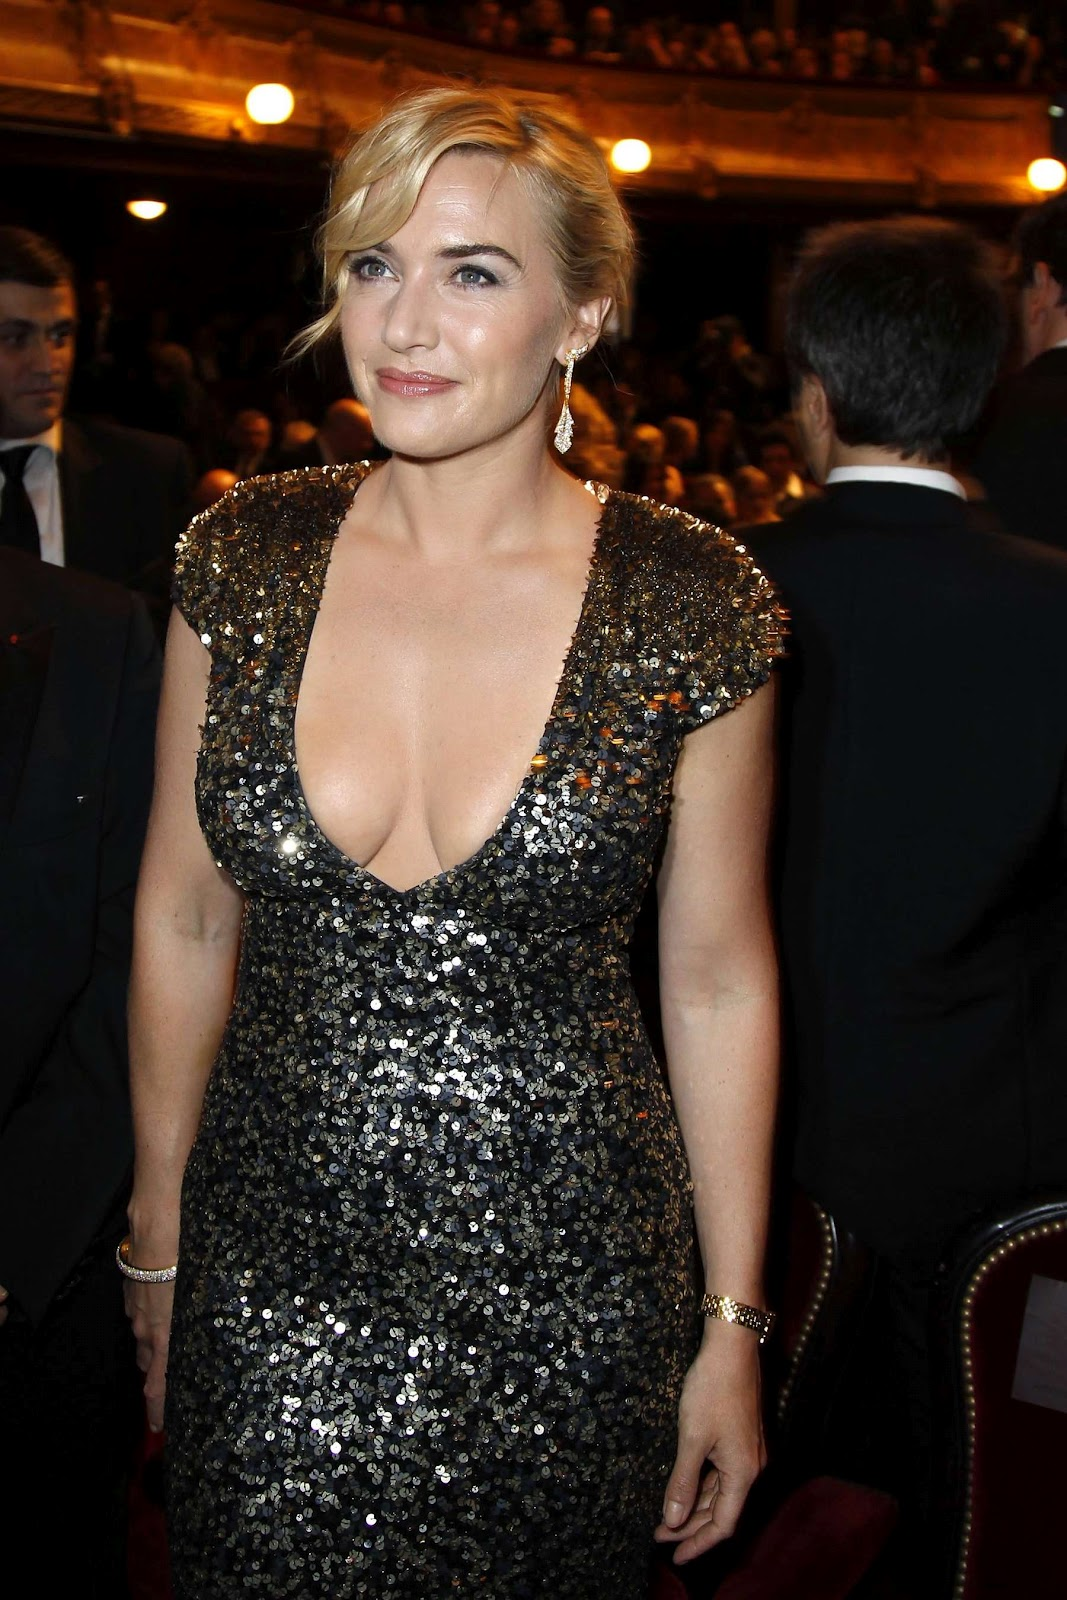 http://2.bp.blogspot.com/-wynqP8QcDlo/T0jl4CUK4uI/AAAAAAAALdg/bNyz86NewBU/s1600/Kate+Winslet+cleavage+at+Cesar+Film+Awards+2012-02.jpg